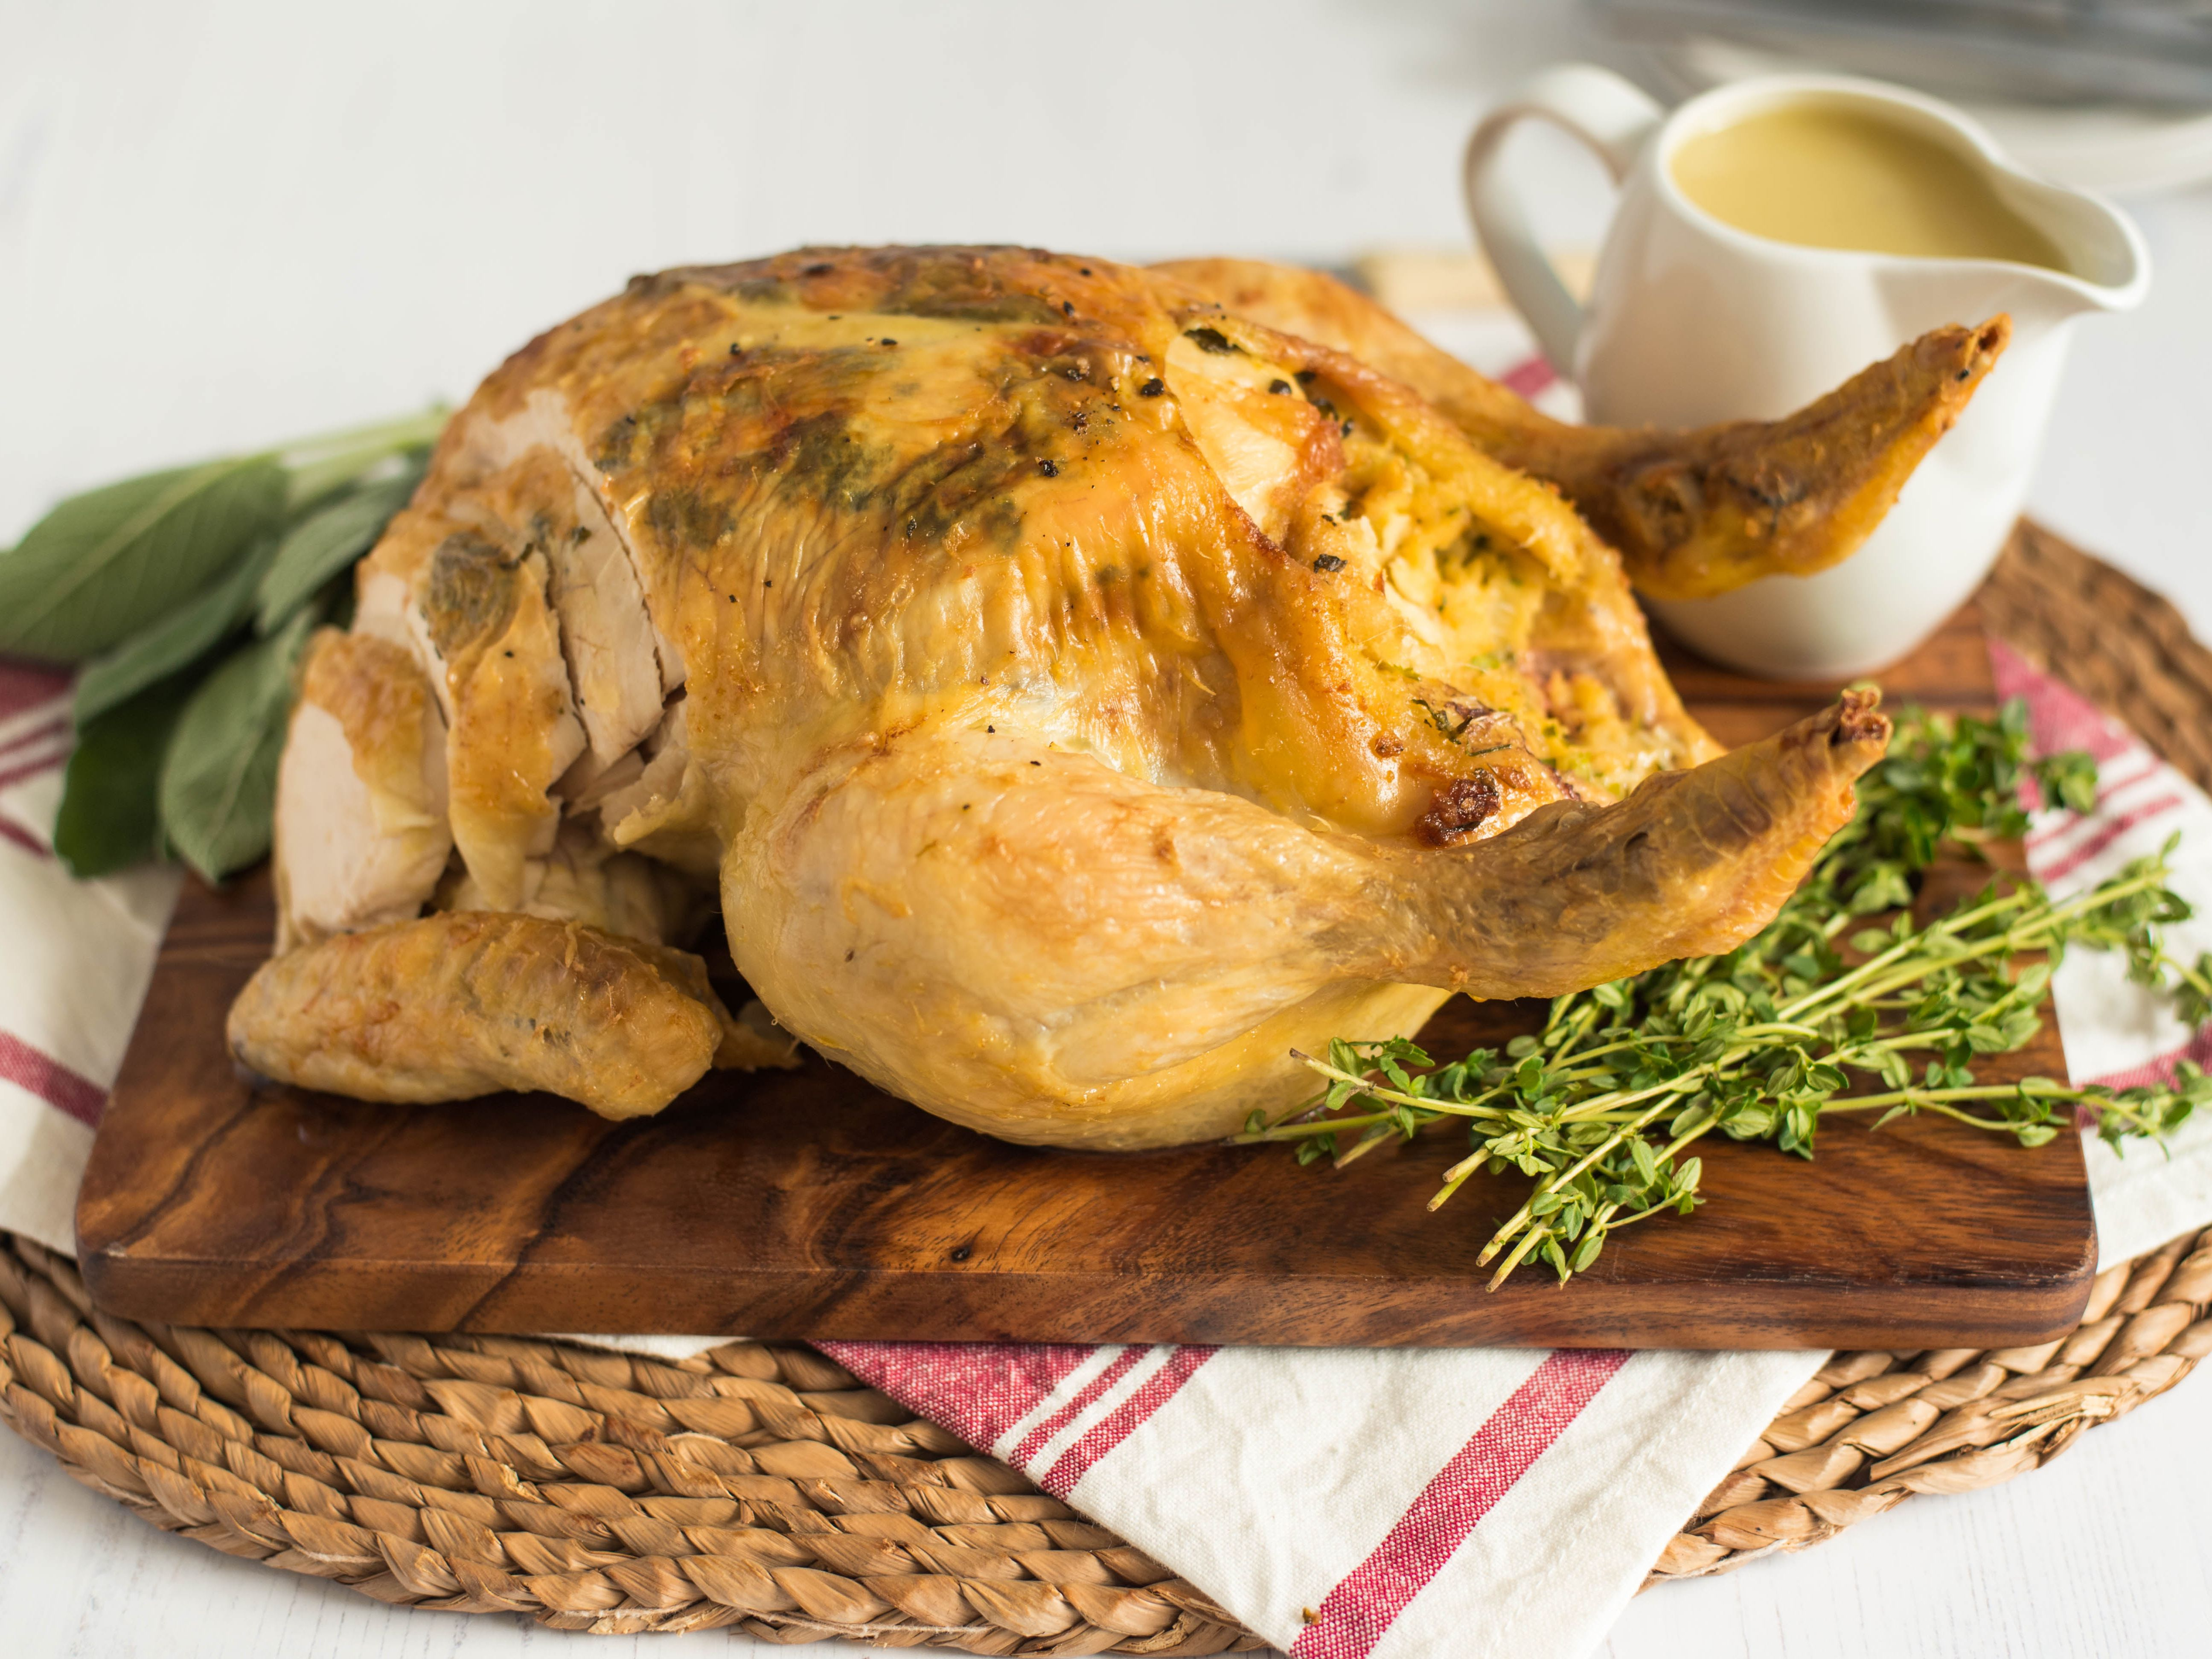 Whole Stuffed Chicken With Pan Gravy Recipe